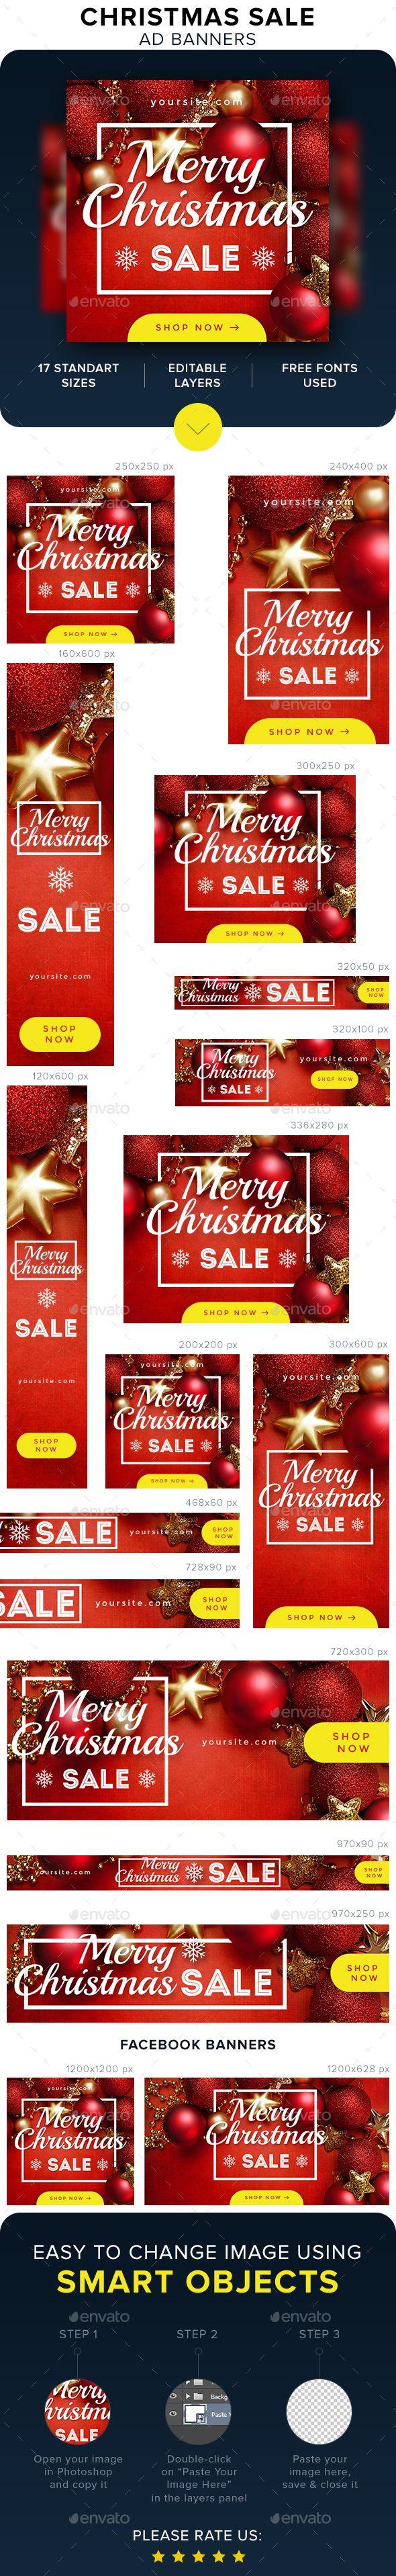 Christmas Sale Banners Template PSD